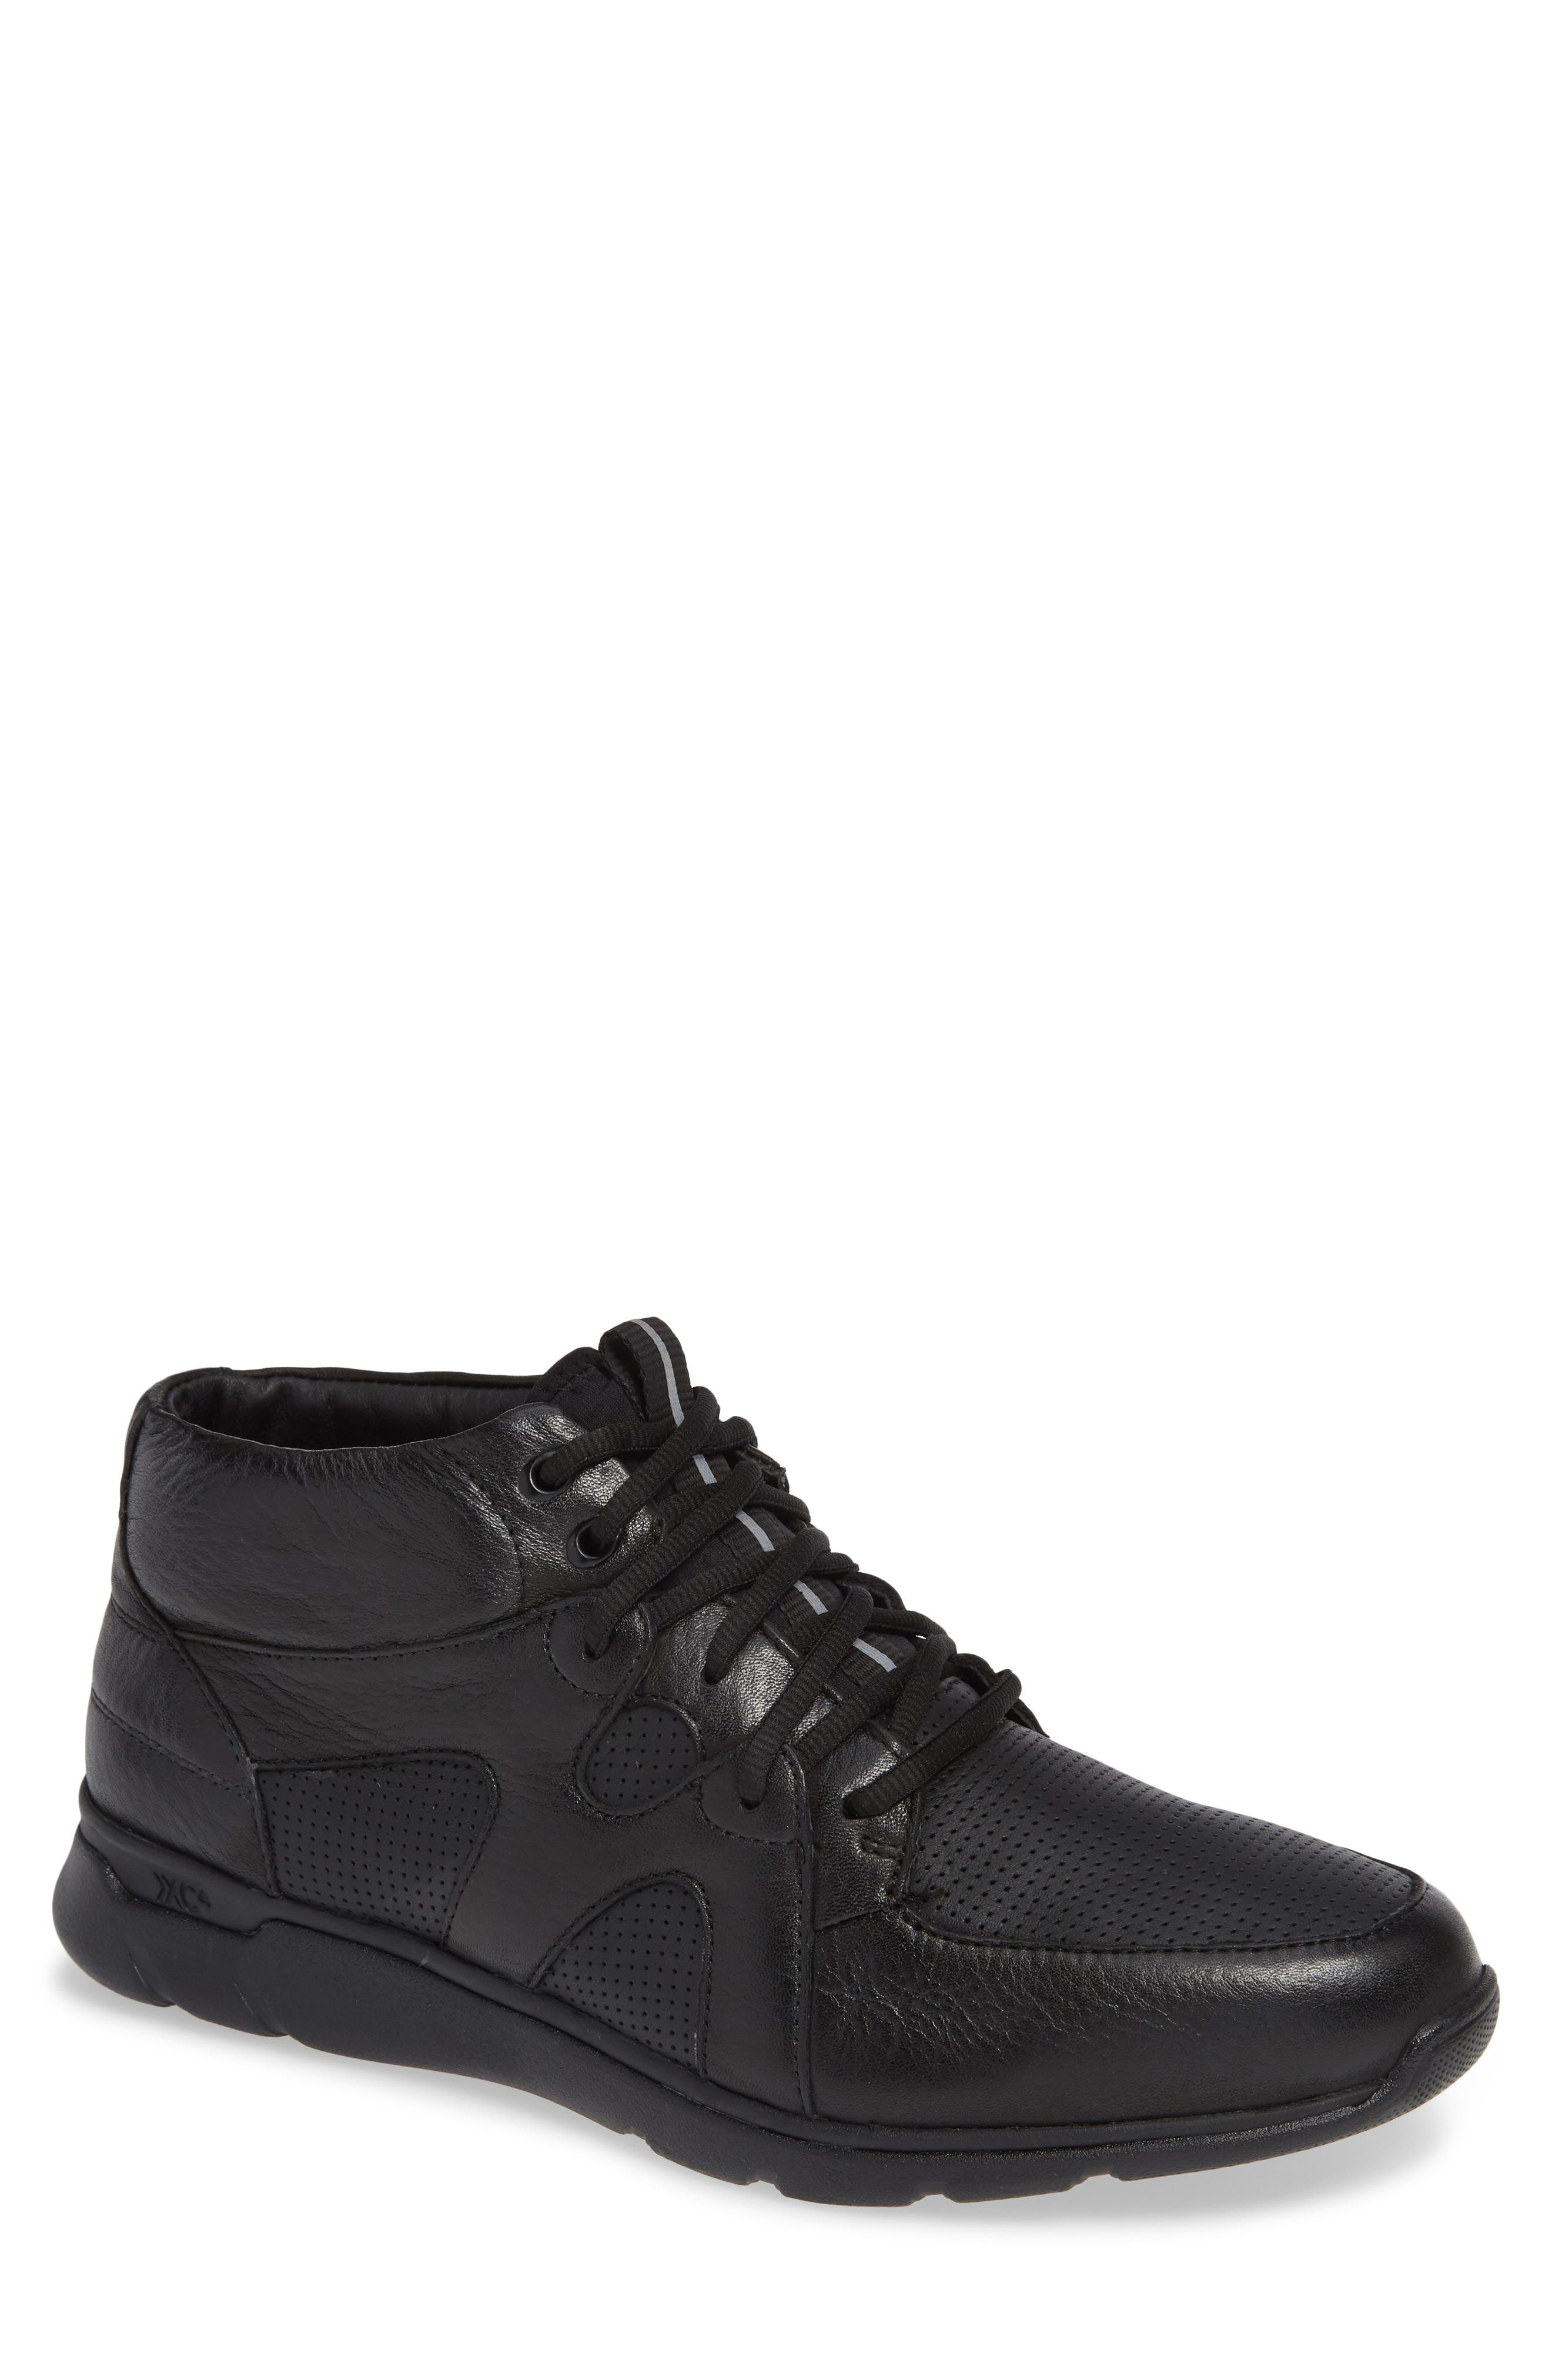 Prentiss Waterproof Sneaker,                         Main,                         color, BLACK LEATHER